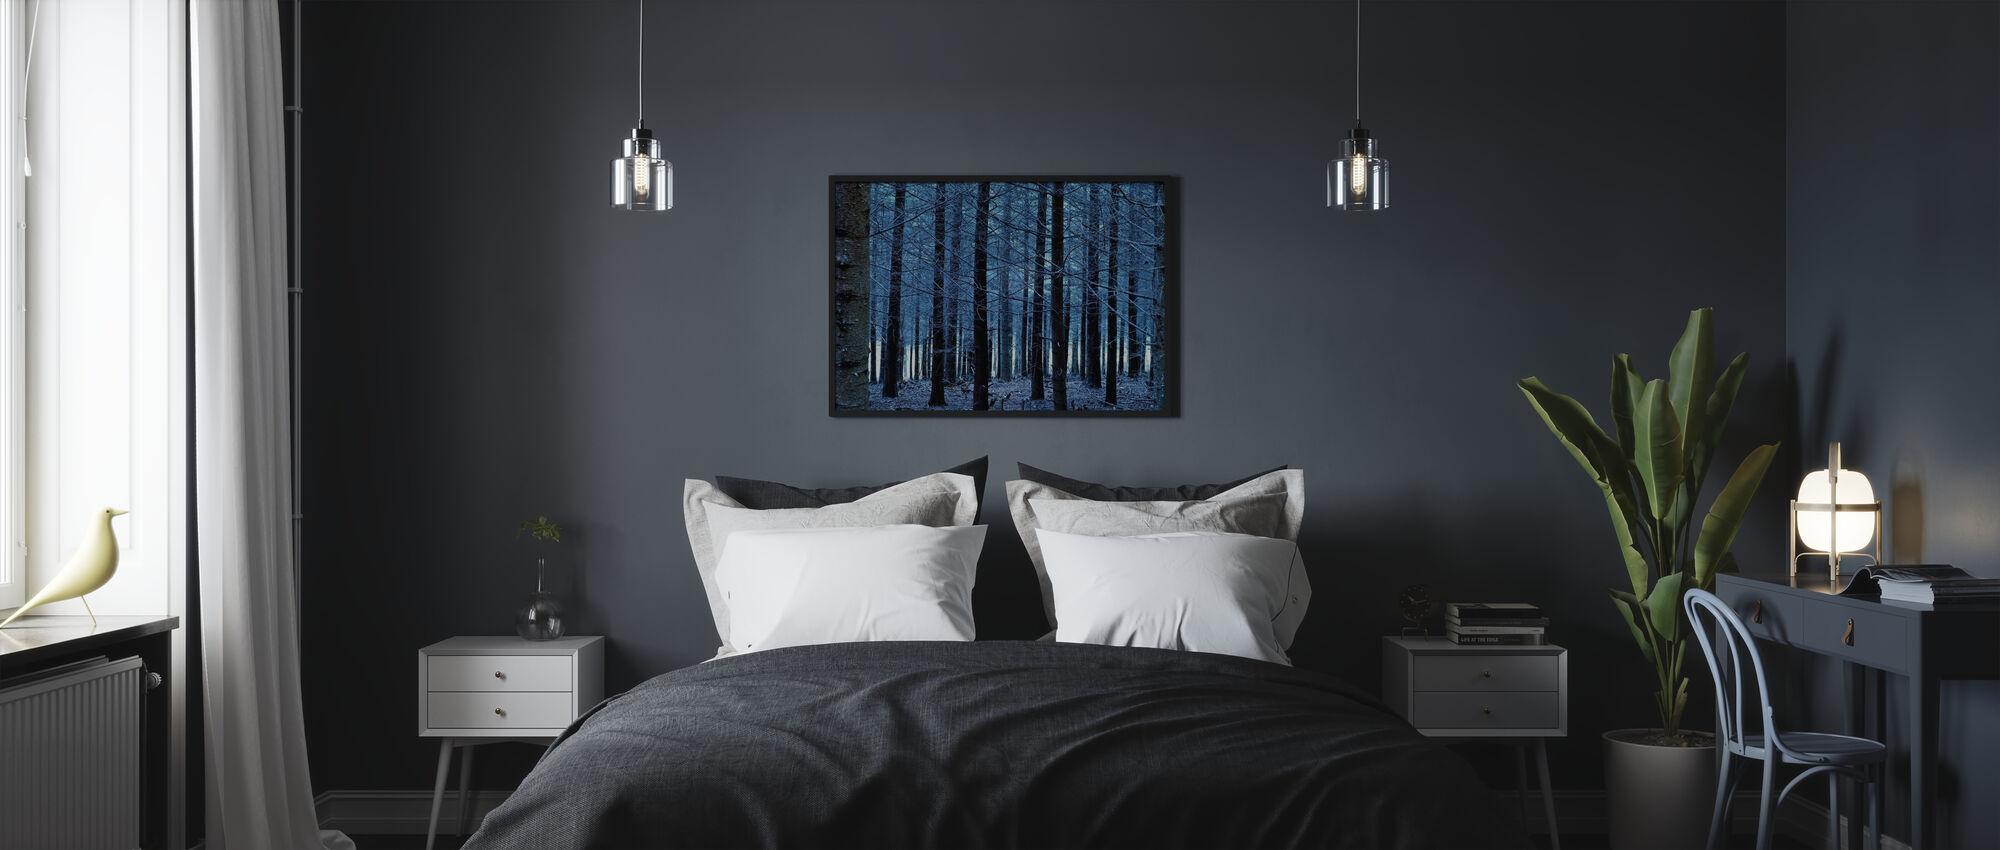 Blå Träd - Inramad tavla - Sovrum